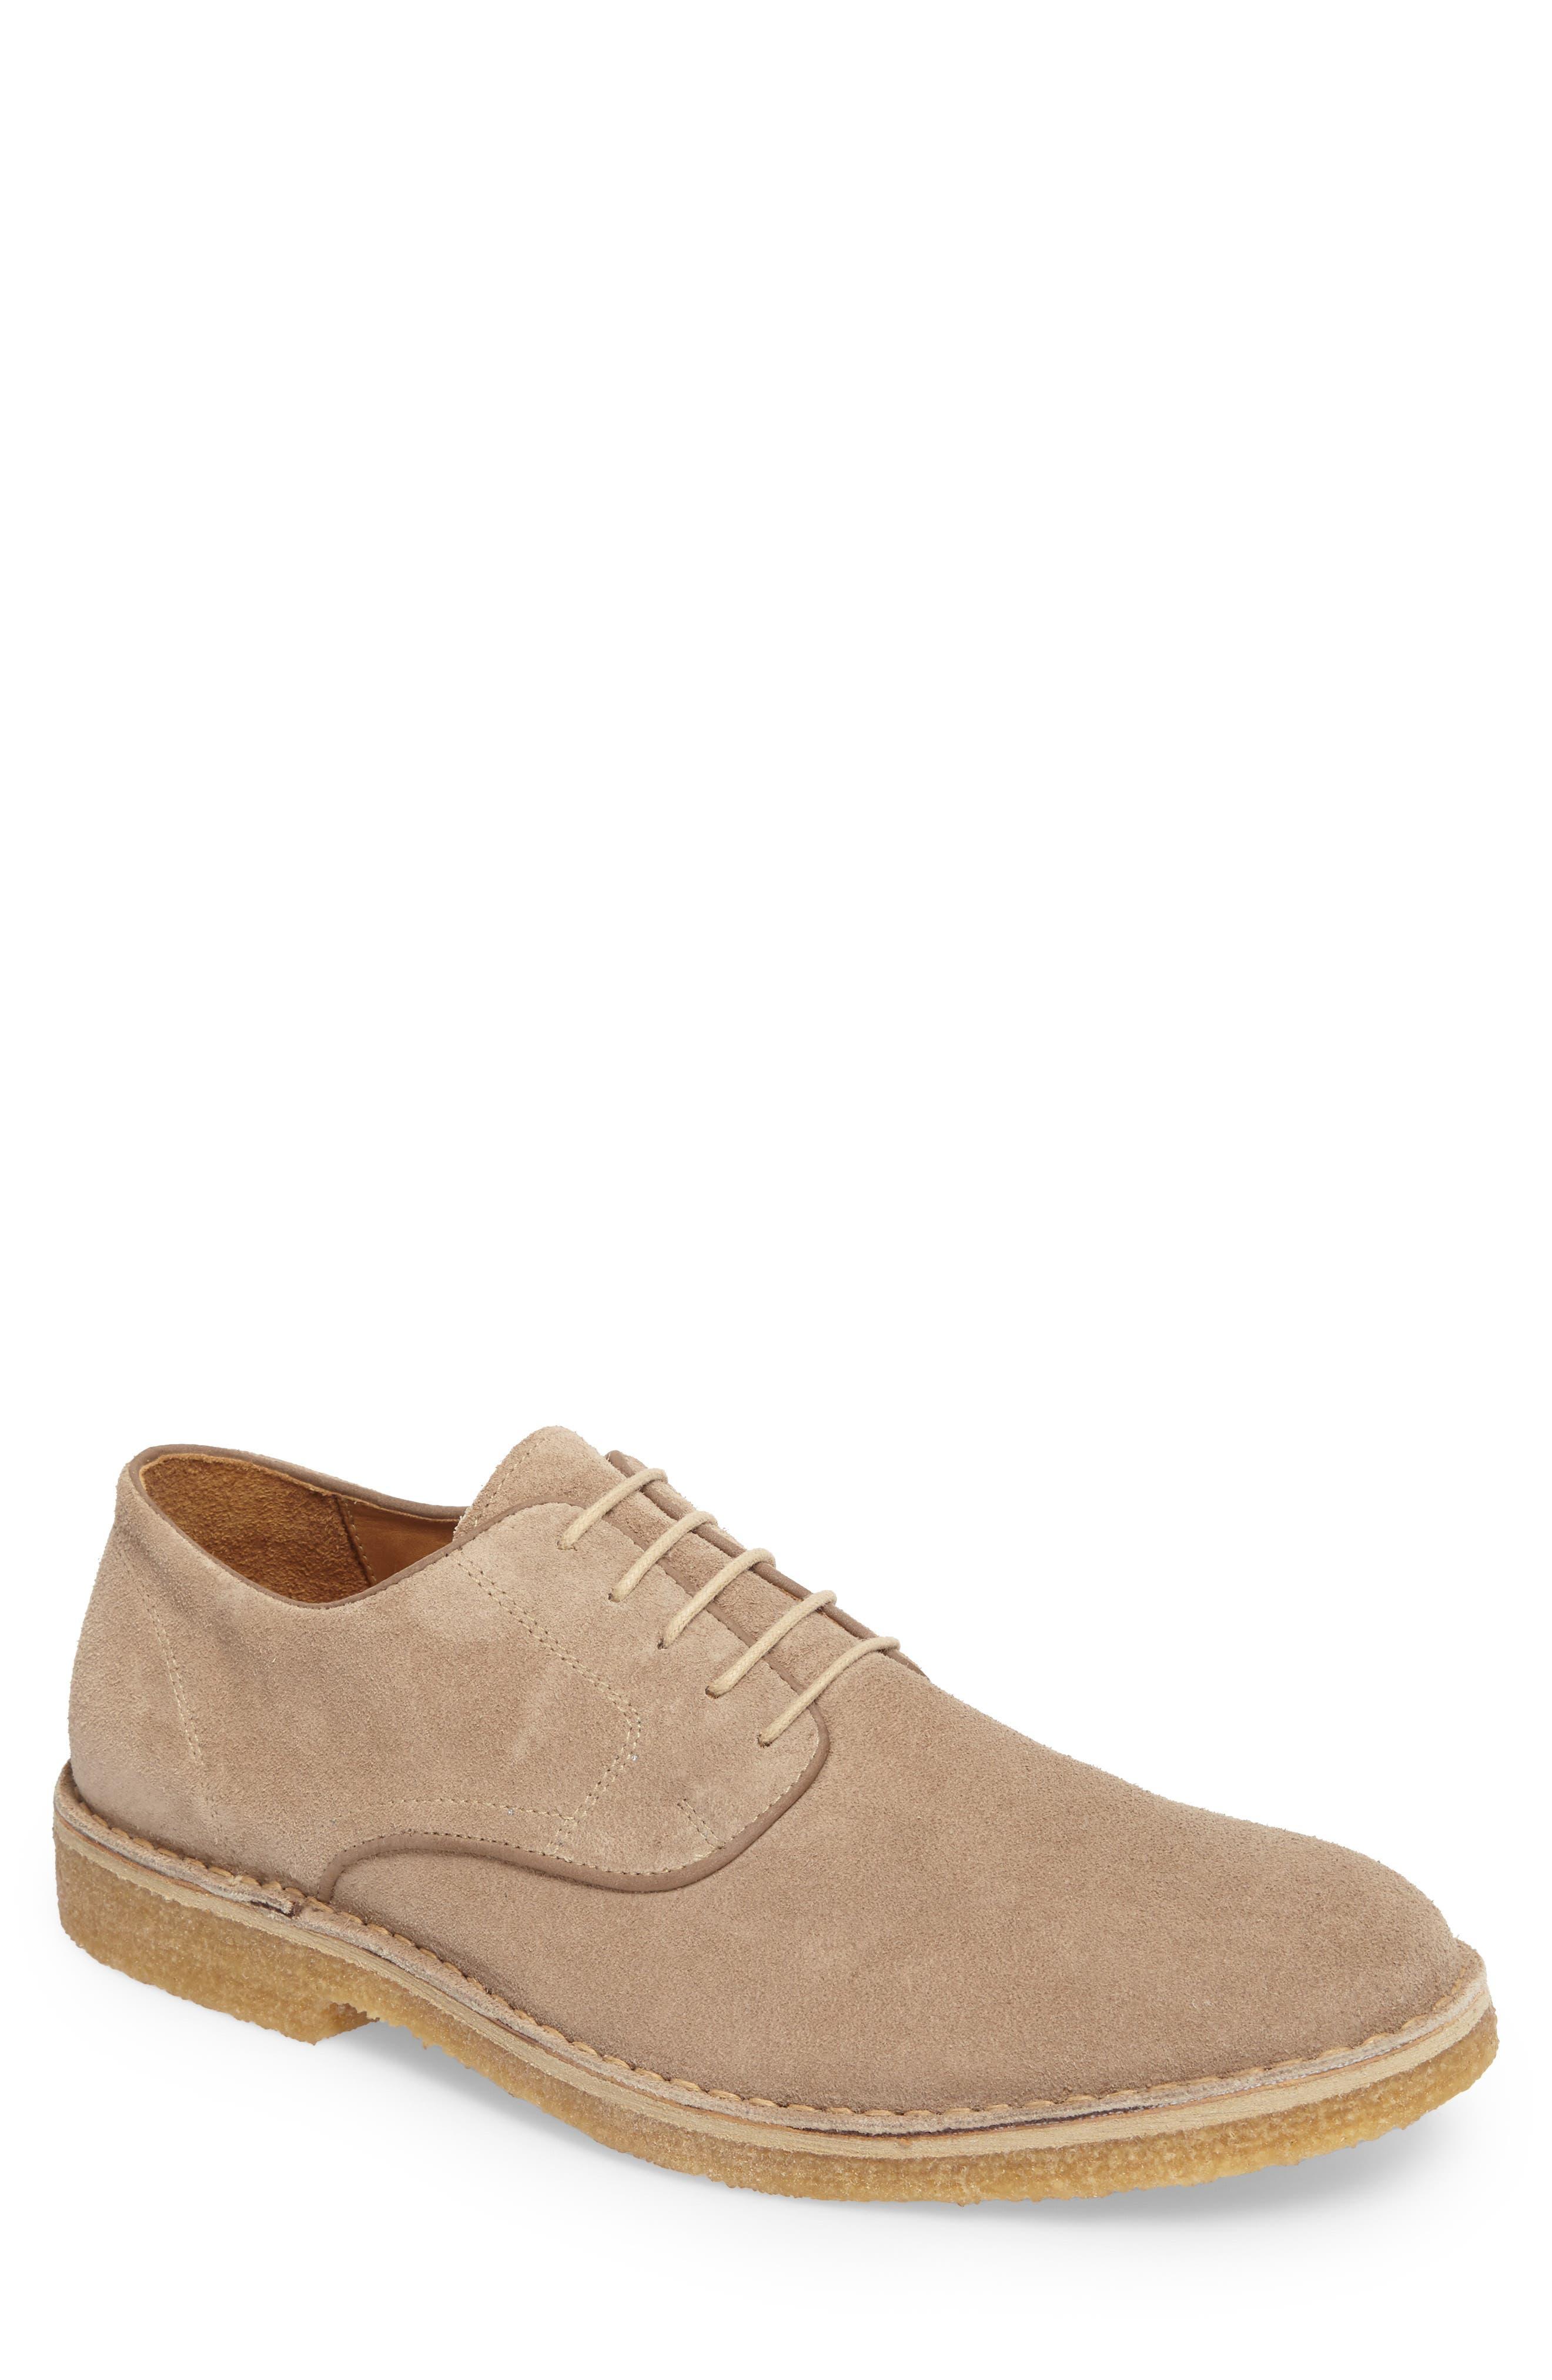 Crescent Buck Shoe,                         Main,                         color, TAN SUEDE